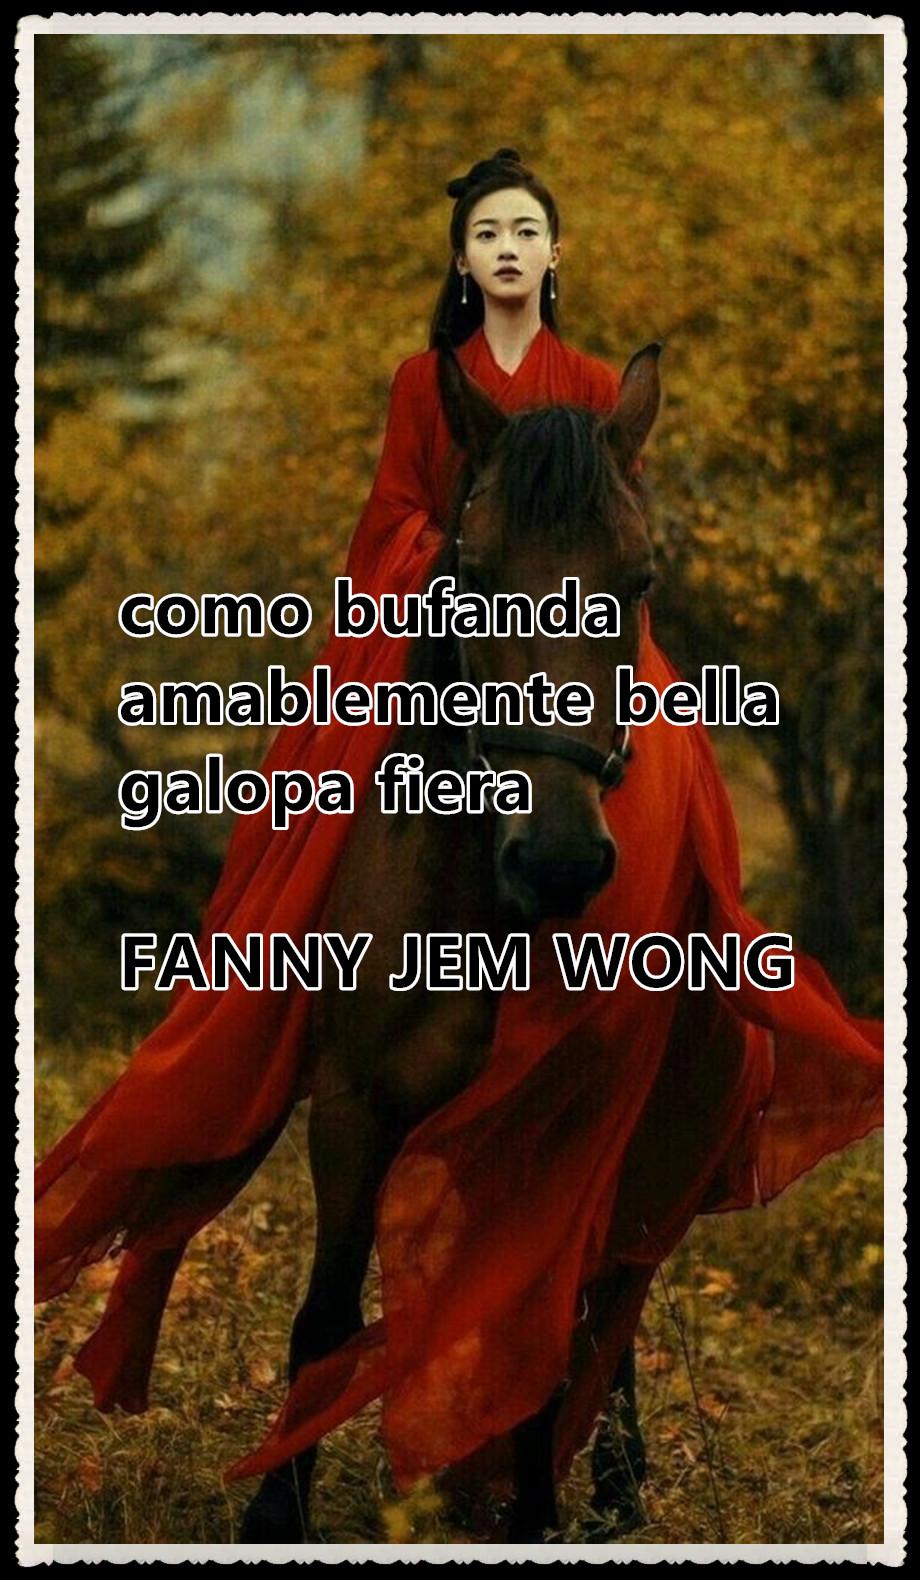 10 HAIKU-FANNY JEM WONG -como bufanda 3